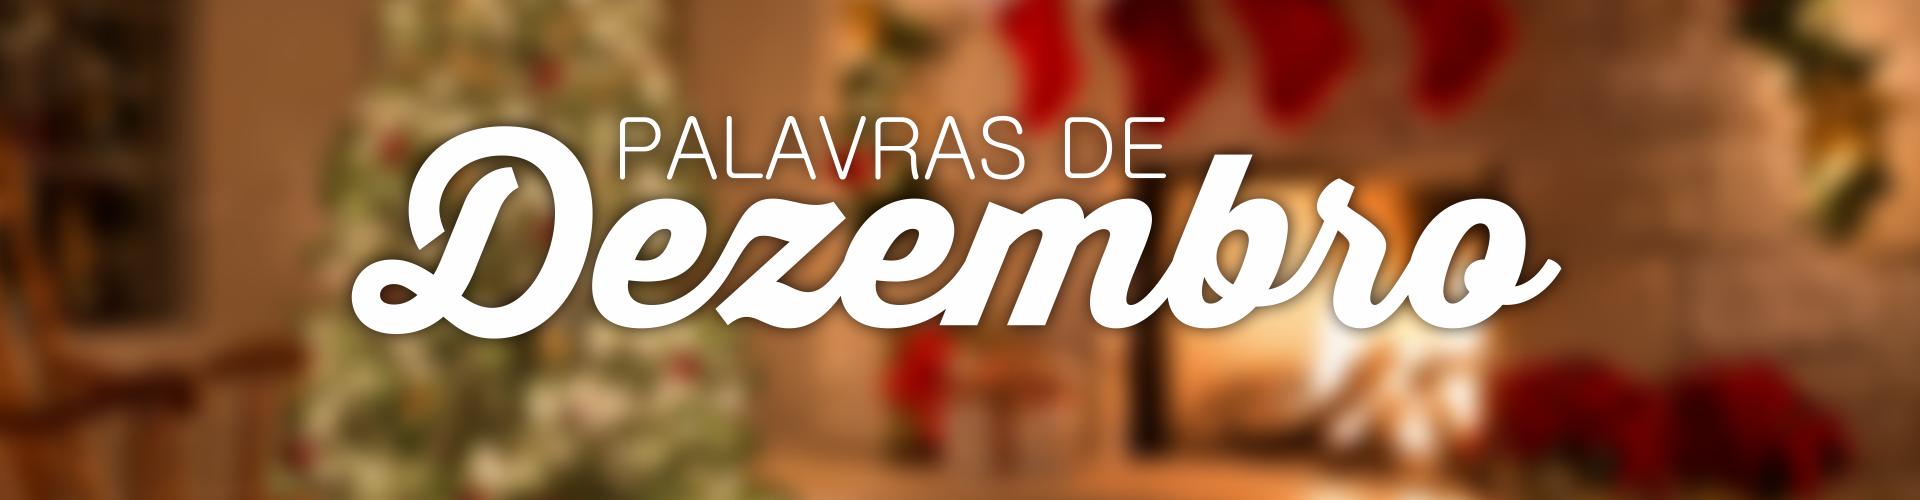 dezembro-banner